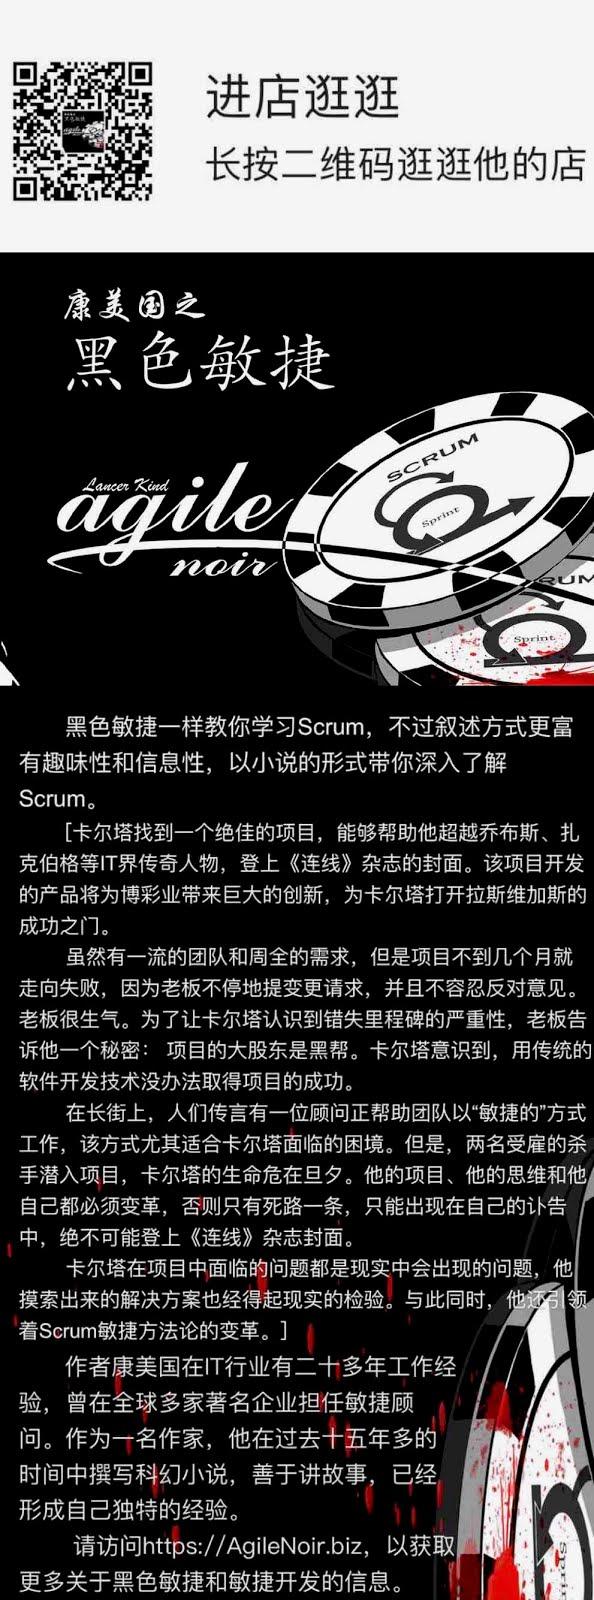 Agile Noir Mandarin edition (English ed. is further down)